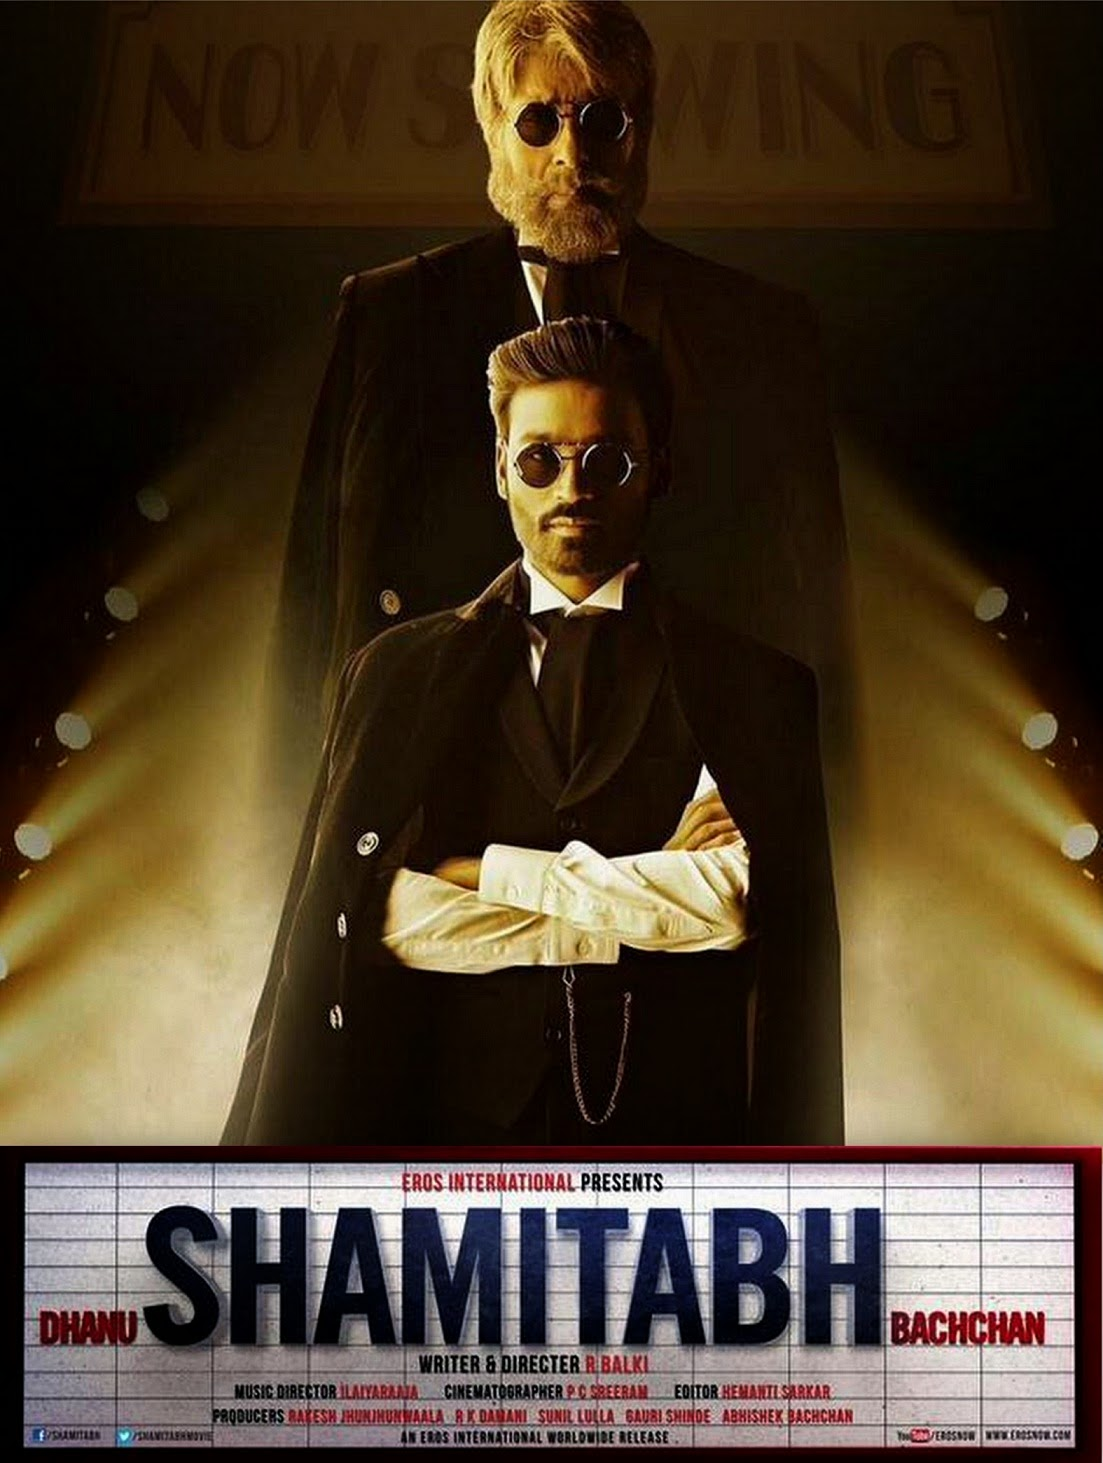 Tall Amitabh Bachchan behind Dhanush in Shamitabh movie poster